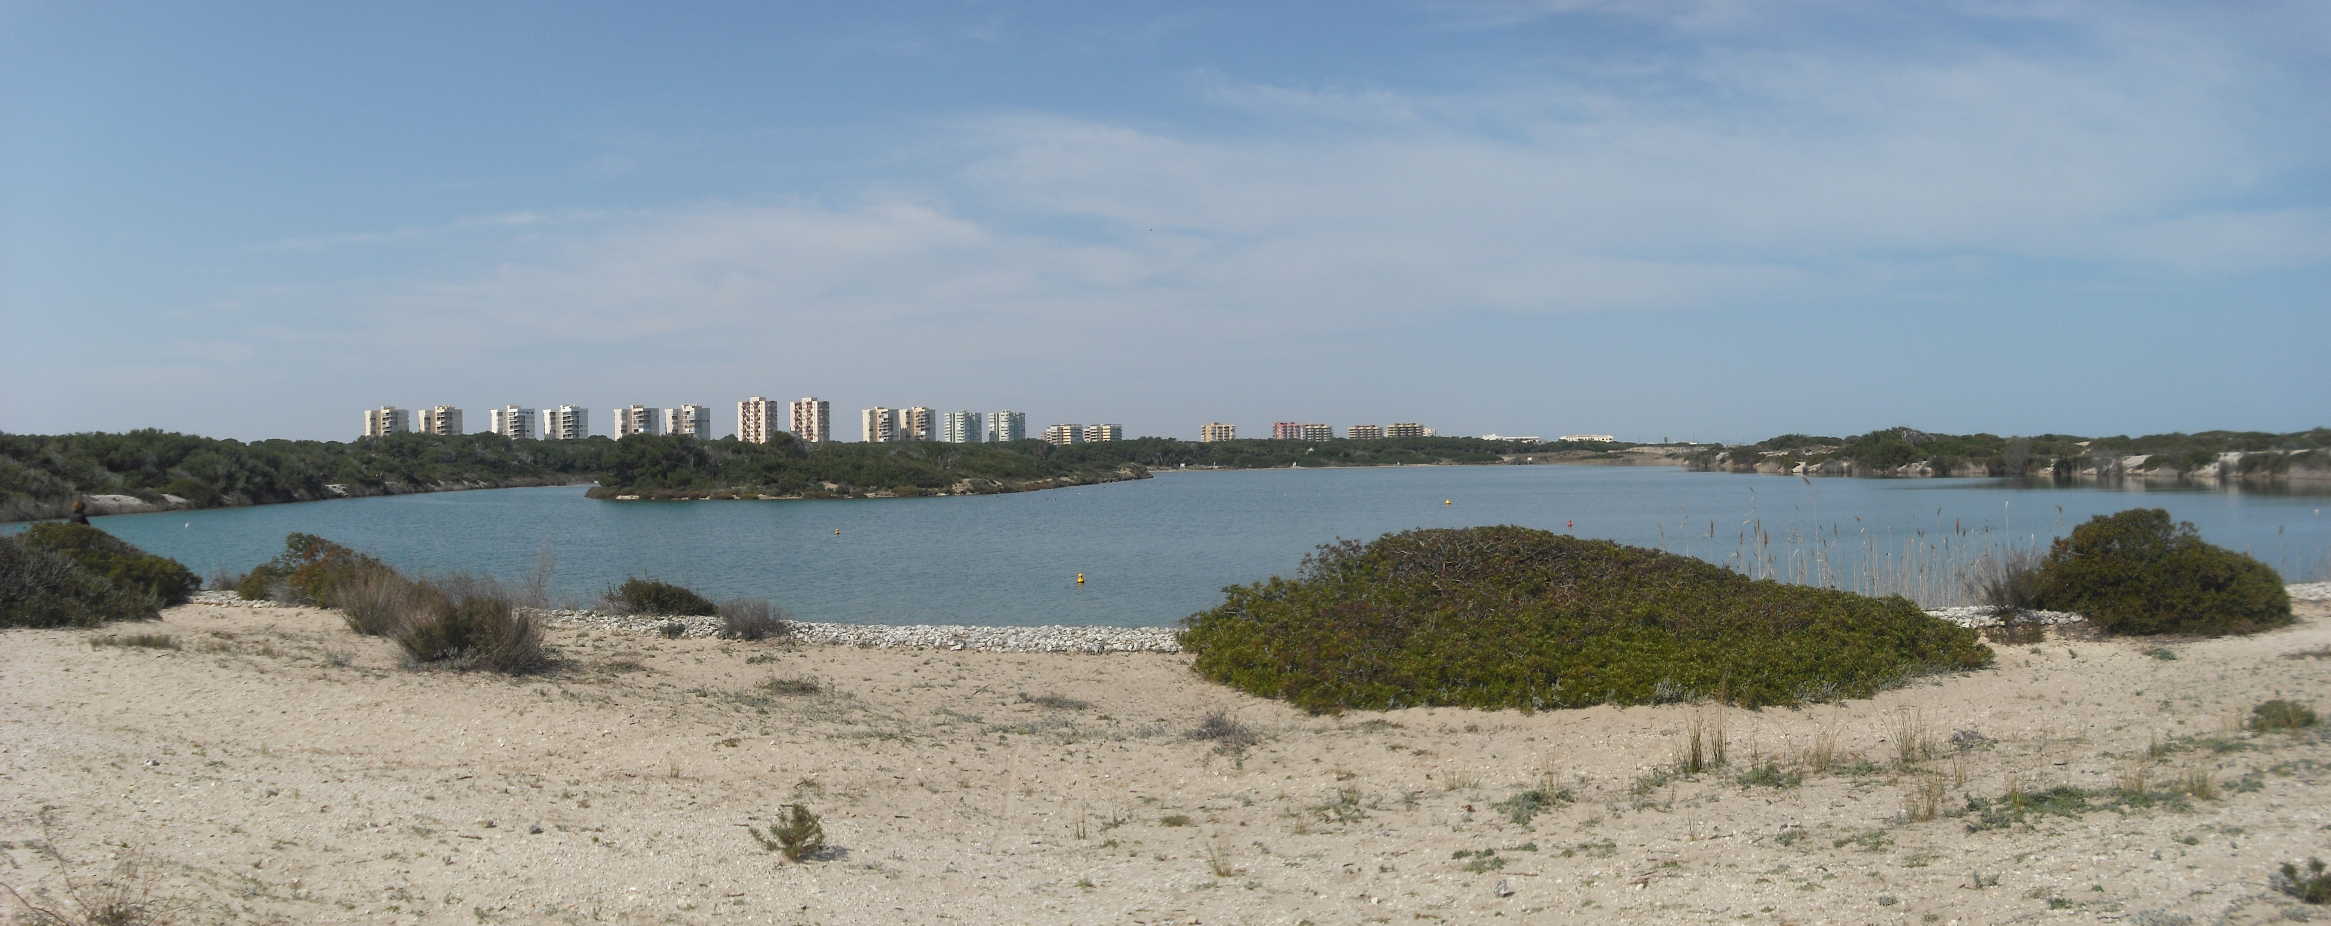 Via verde Valencia-Saler, lago de la Albufera